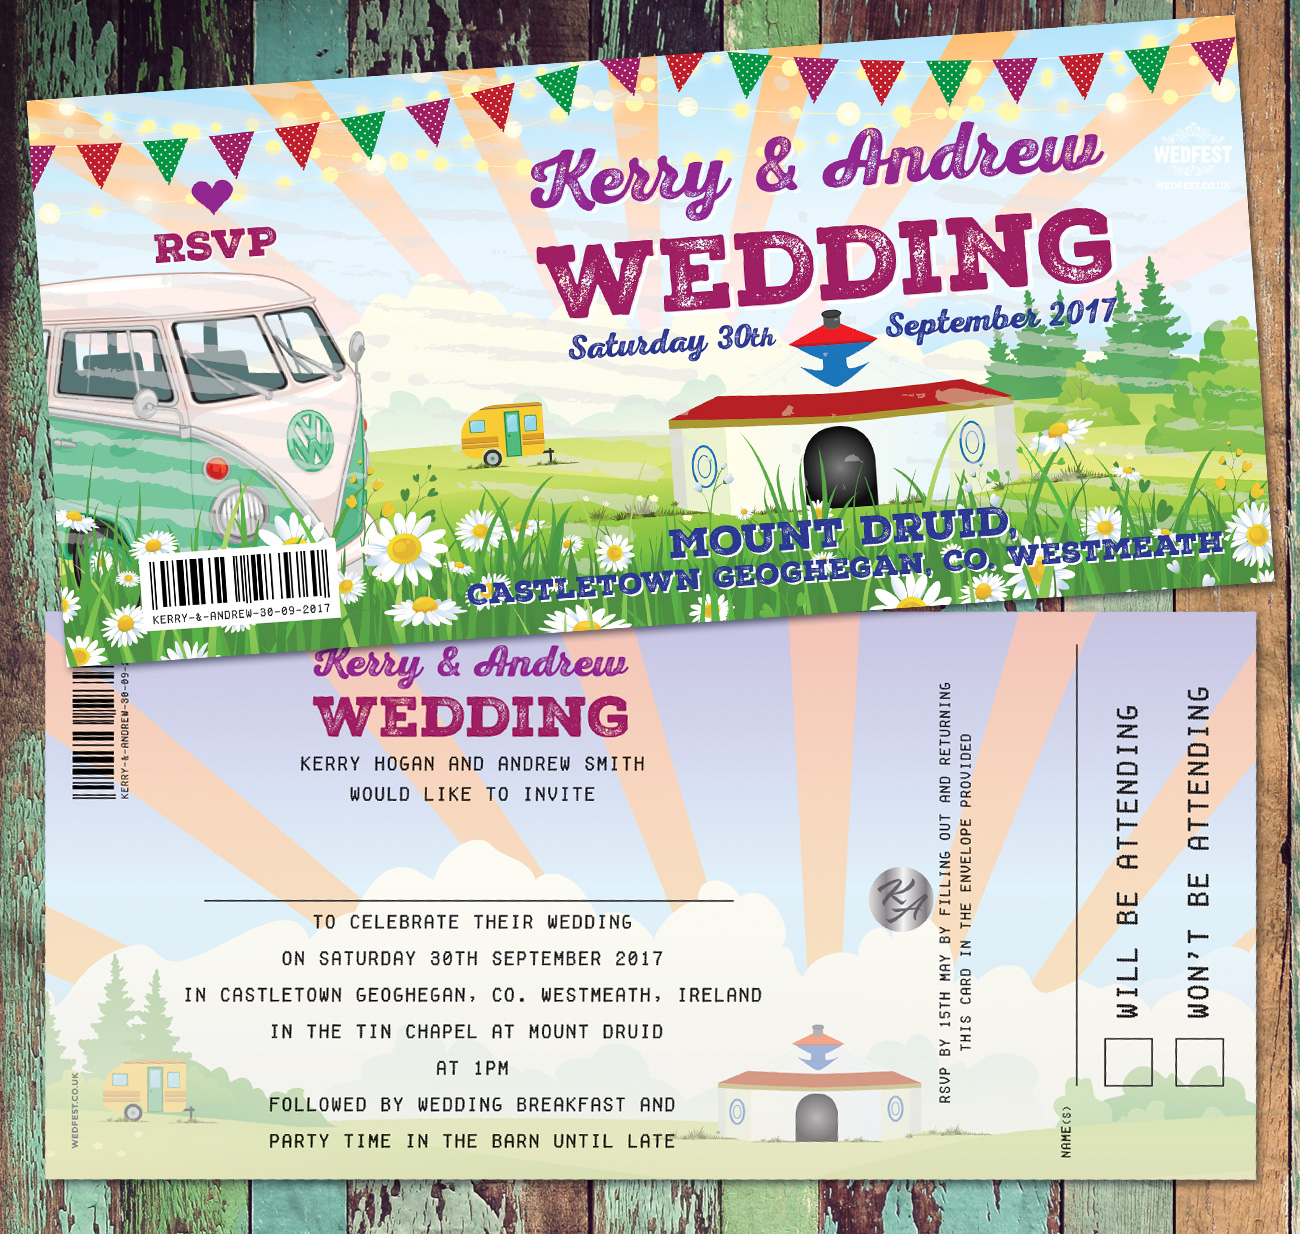 mount druid wedfest festival-weddings ireland invitations